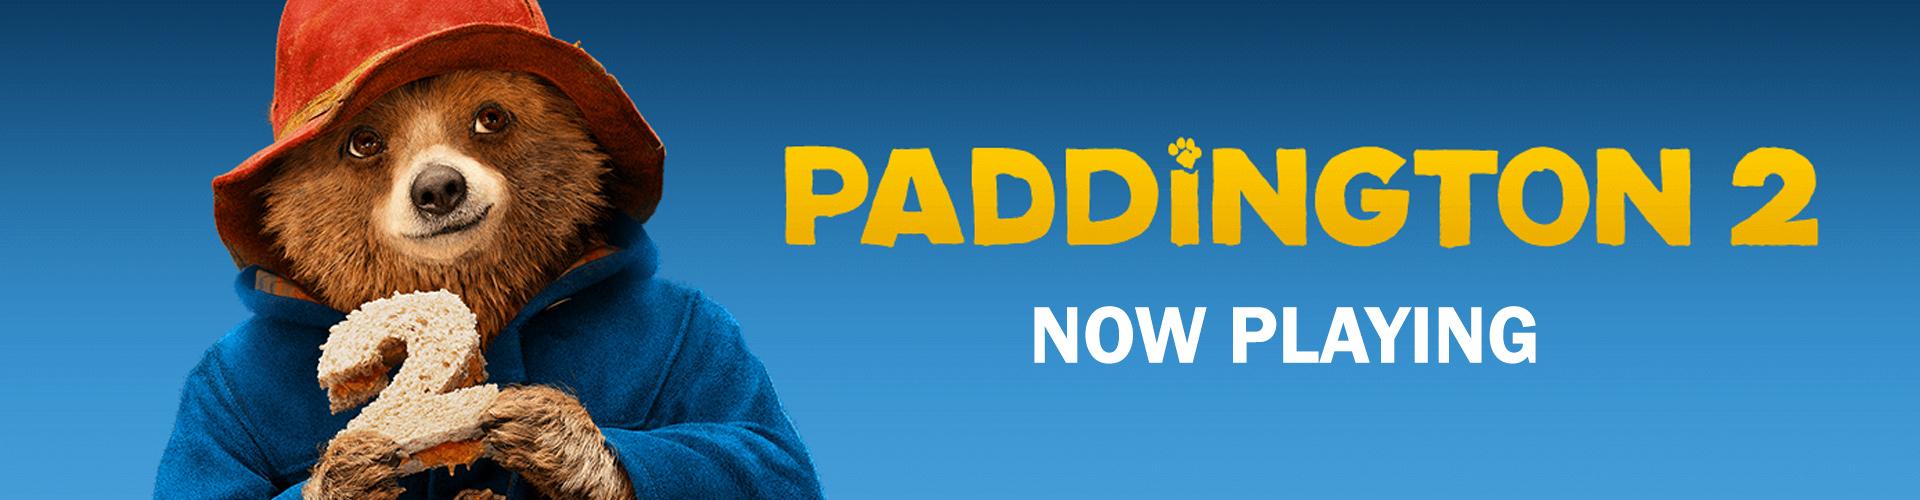 paddington-2-now-playing